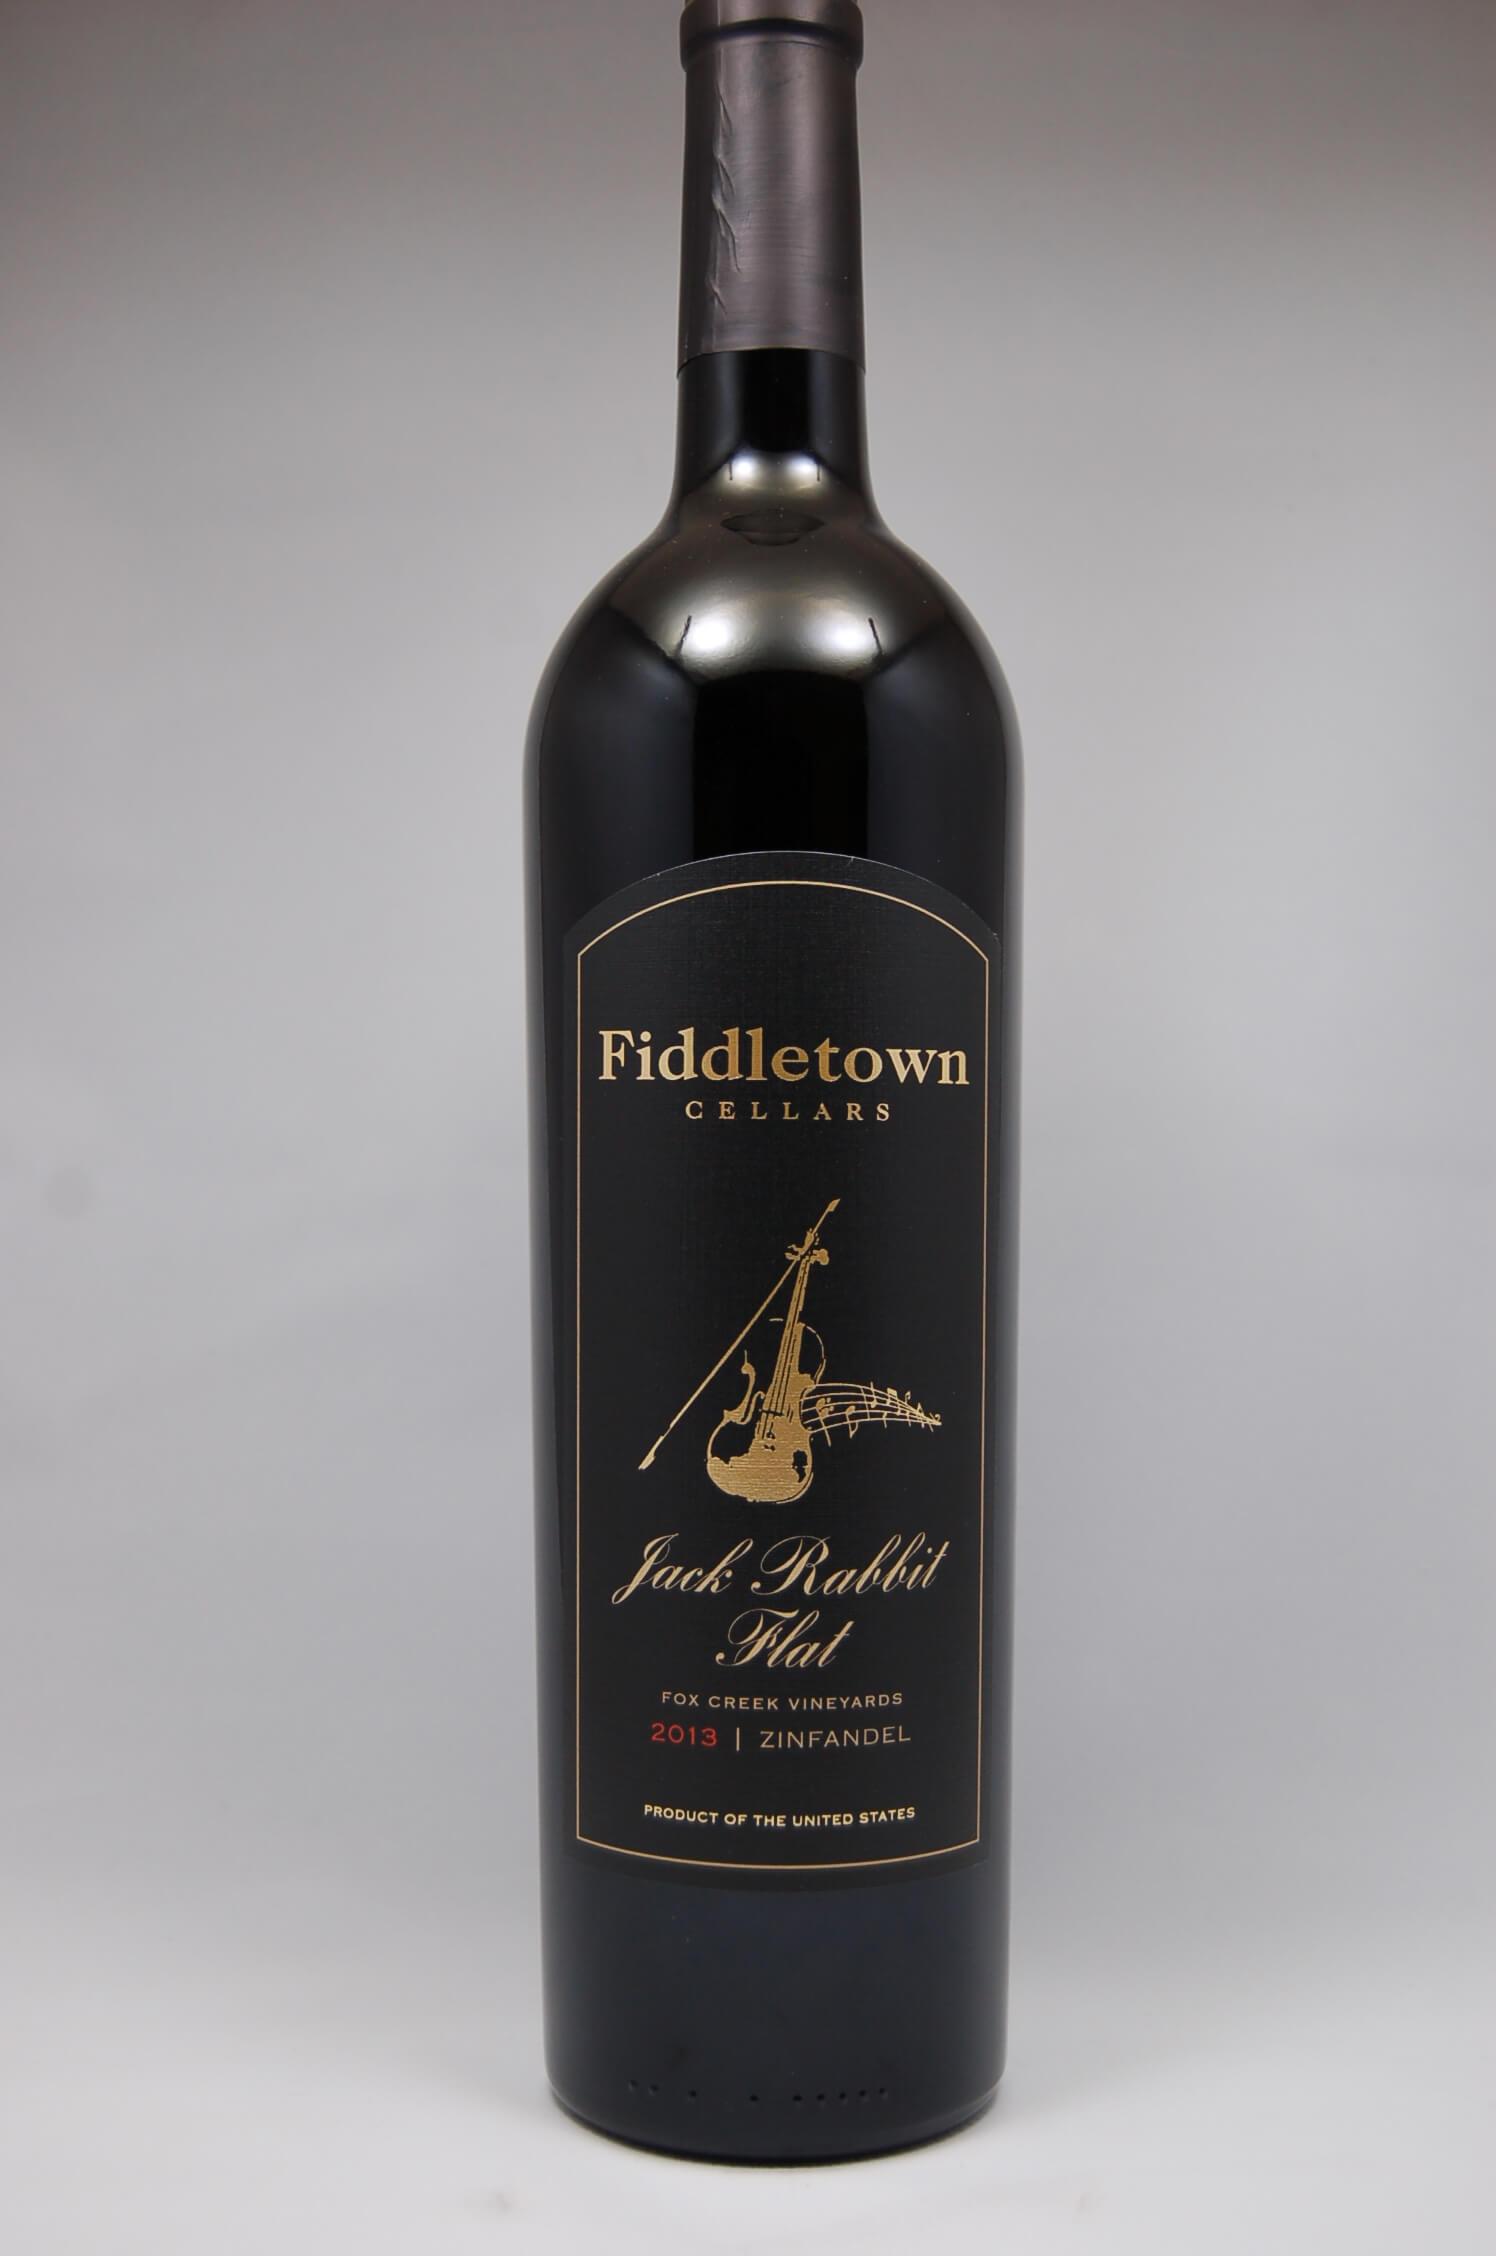 Fiddletown Cellars 2013 Jack Rabbit Flat Zinfandel